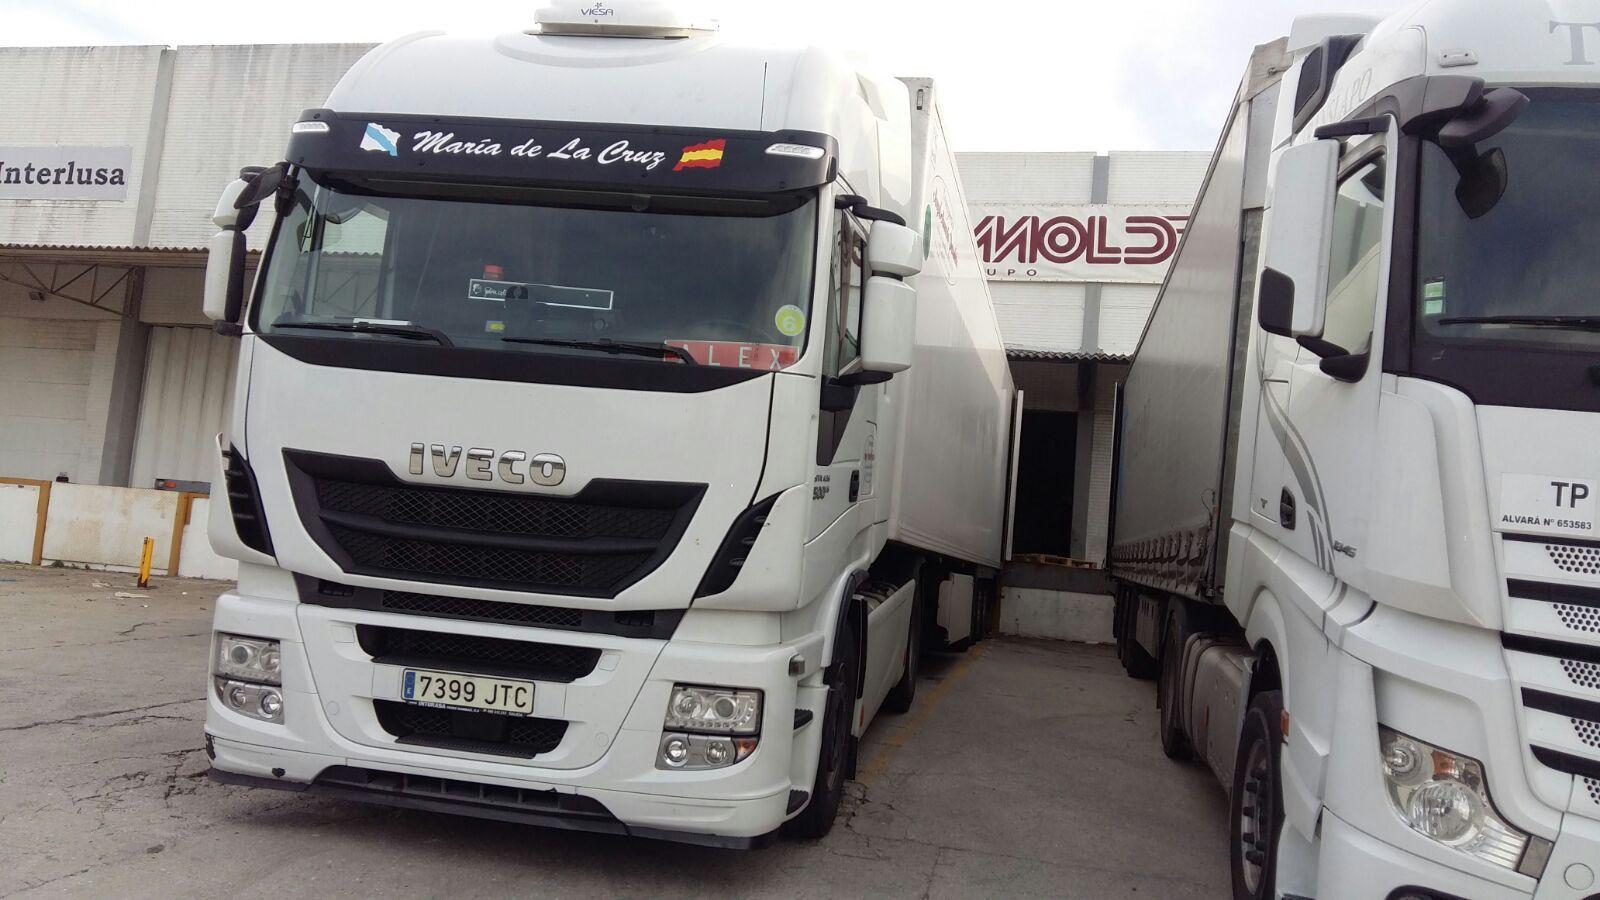 Transporte internacional: Servicios de Trans. Armesto Arango, S. L.